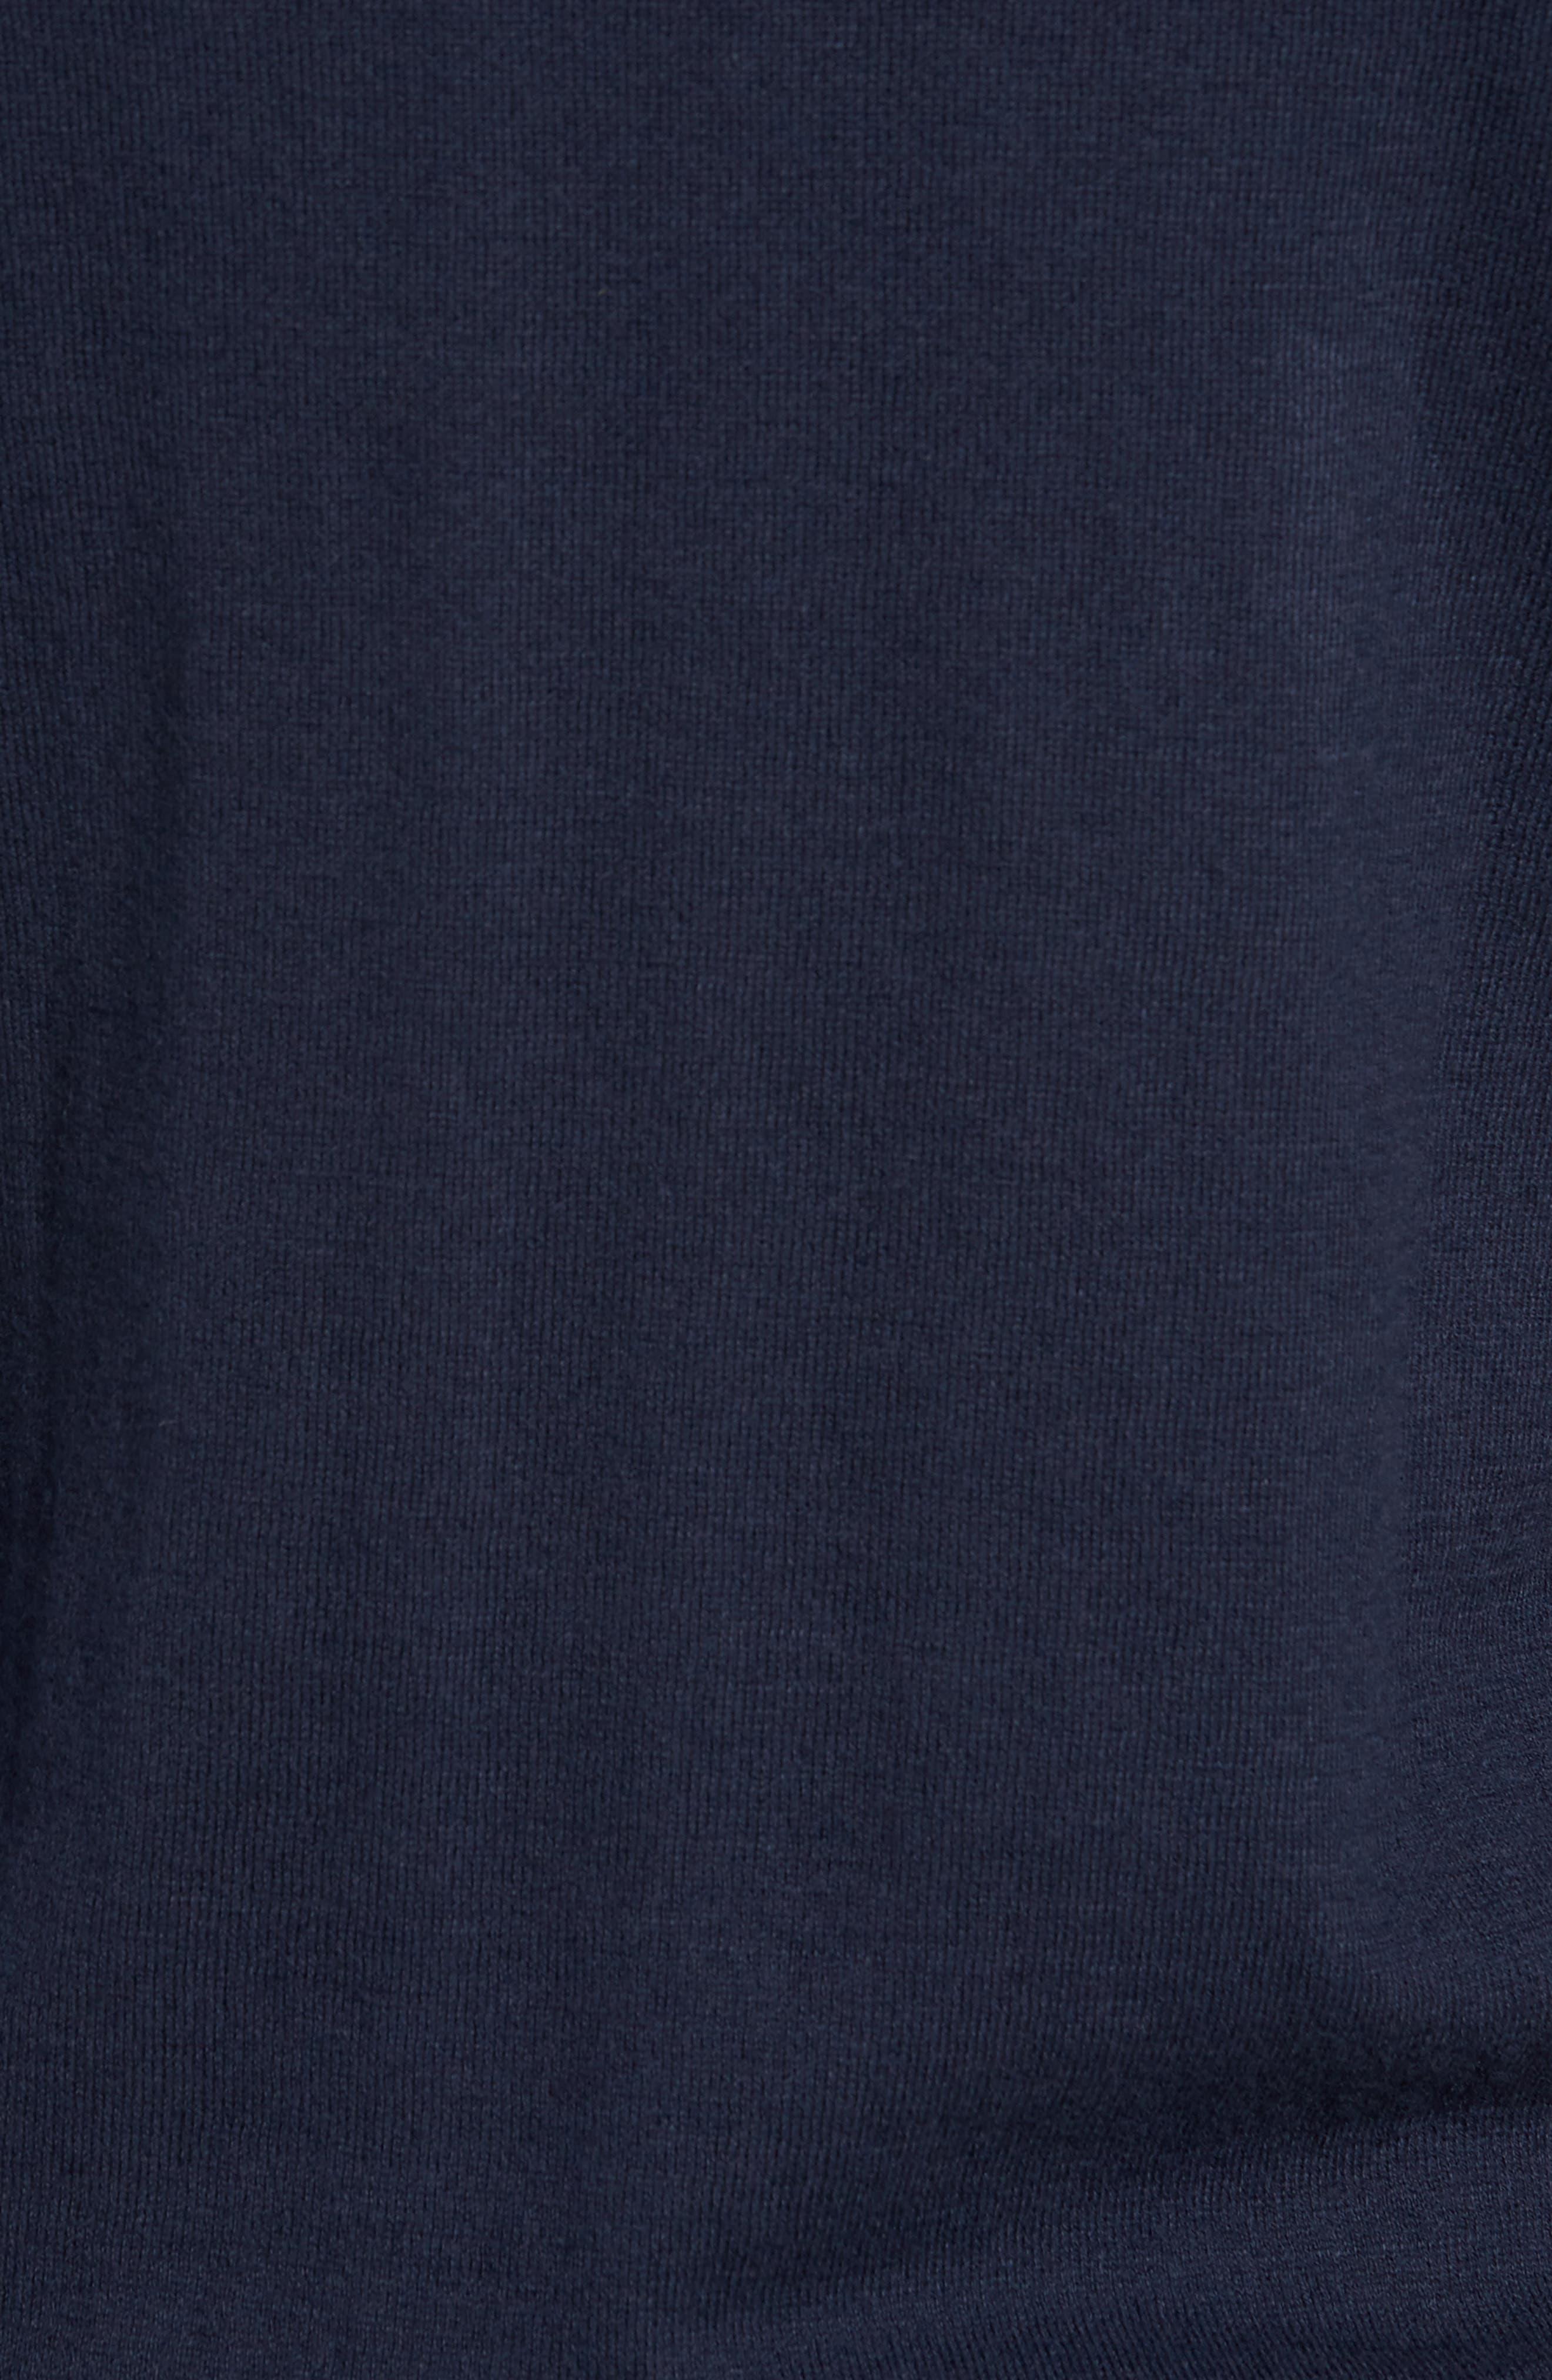 Colorblock Long Sleeve Polo,                             Alternate thumbnail 5, color,                             410